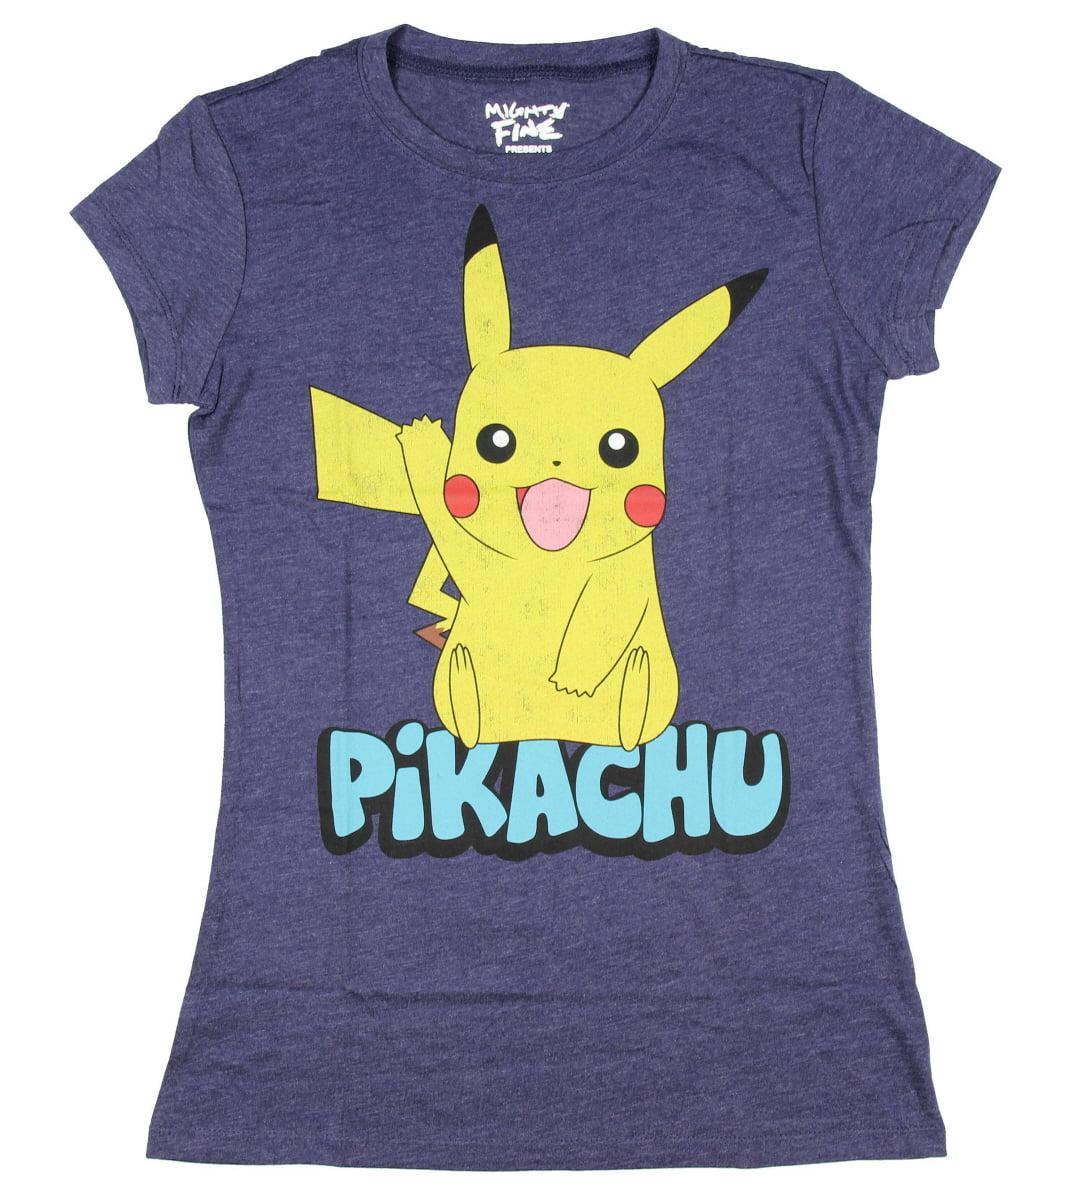 ;Pokemon-; Character Pyjama Top Tee T-Shirt for Ladies Gift New